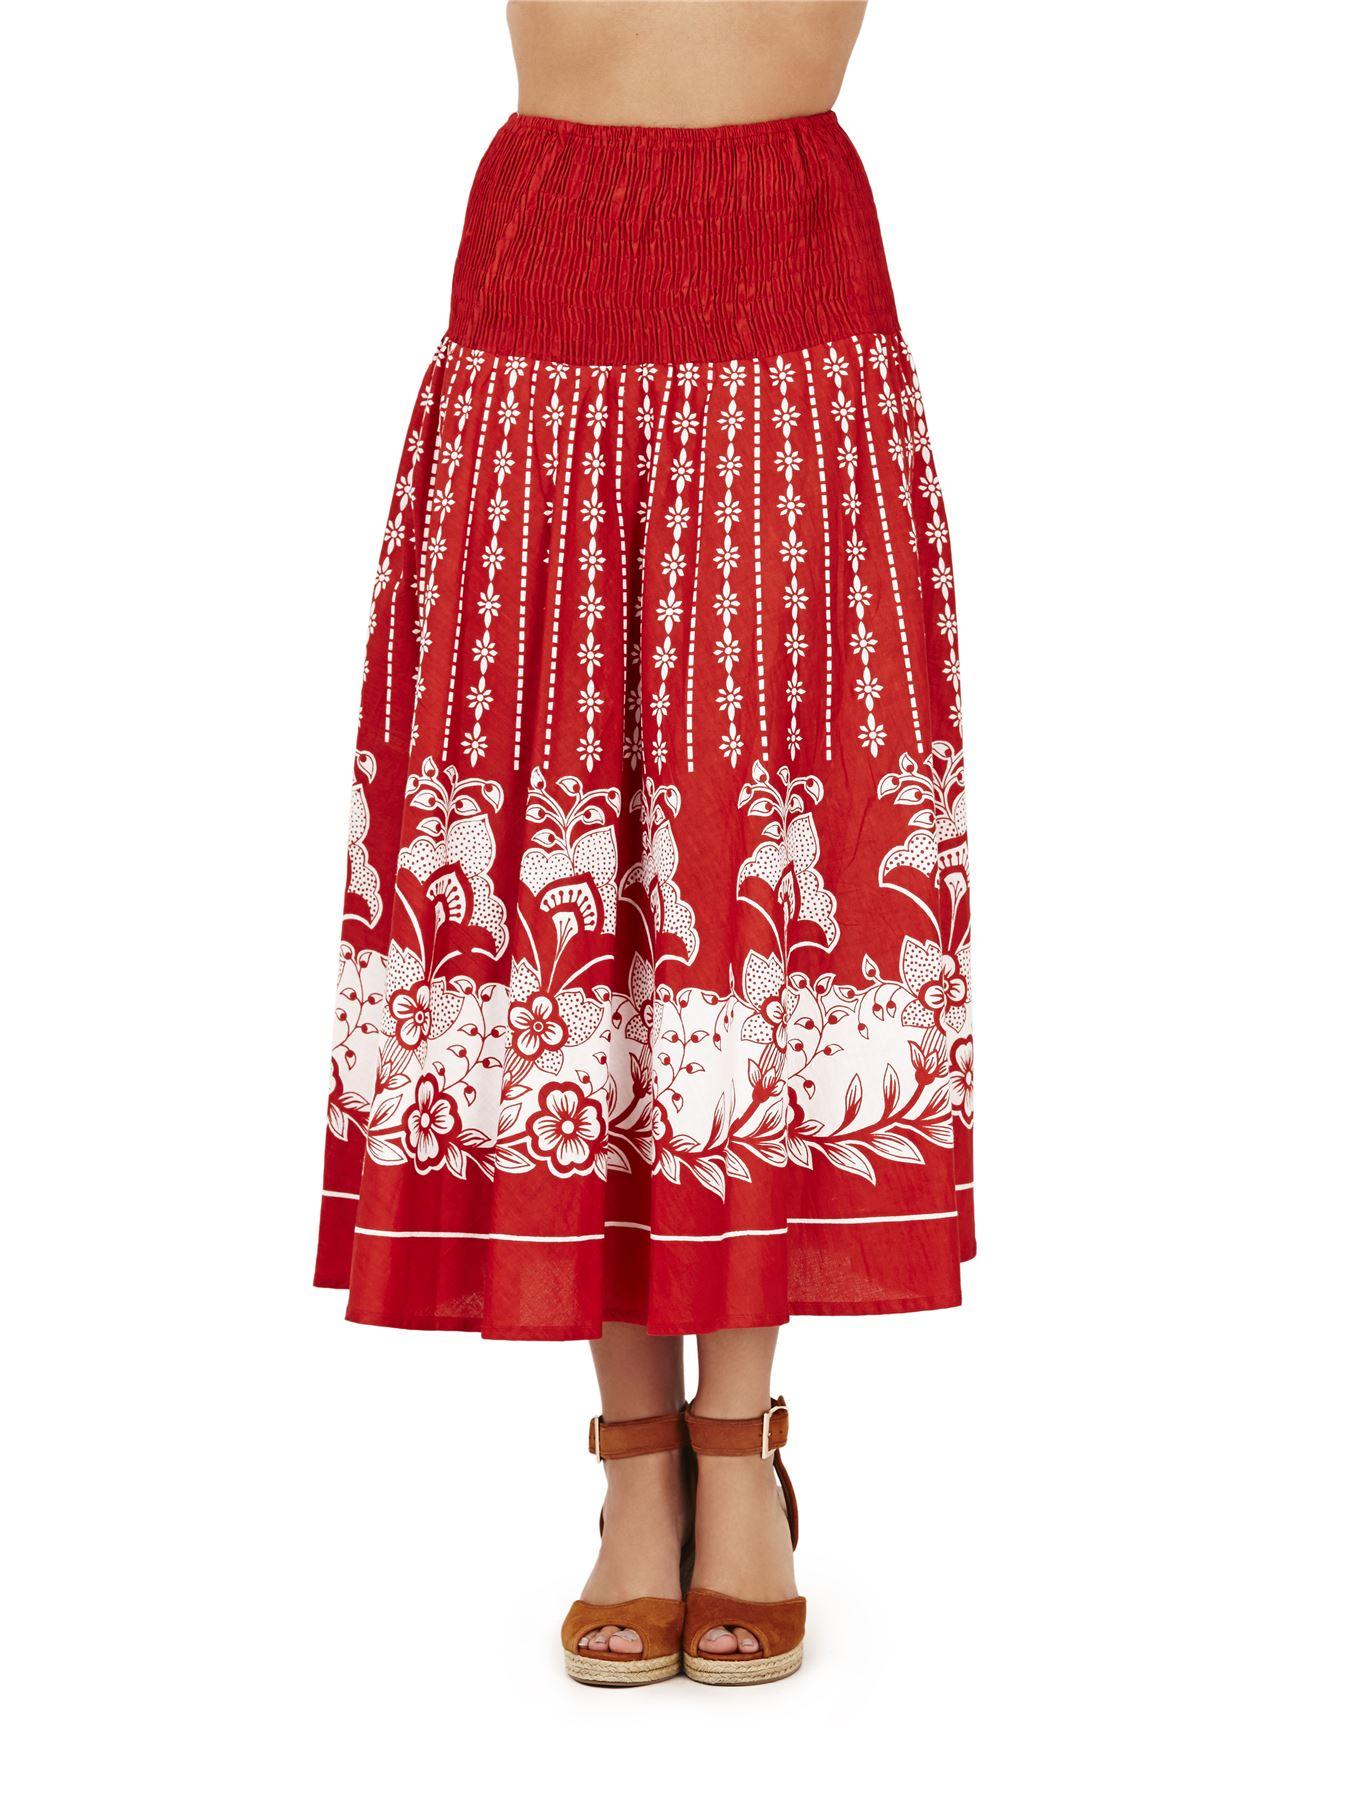 Ladies 100/% Cotton Summer//Beach 2 in 1 Strapless Red Floral Sun Dress Skirt